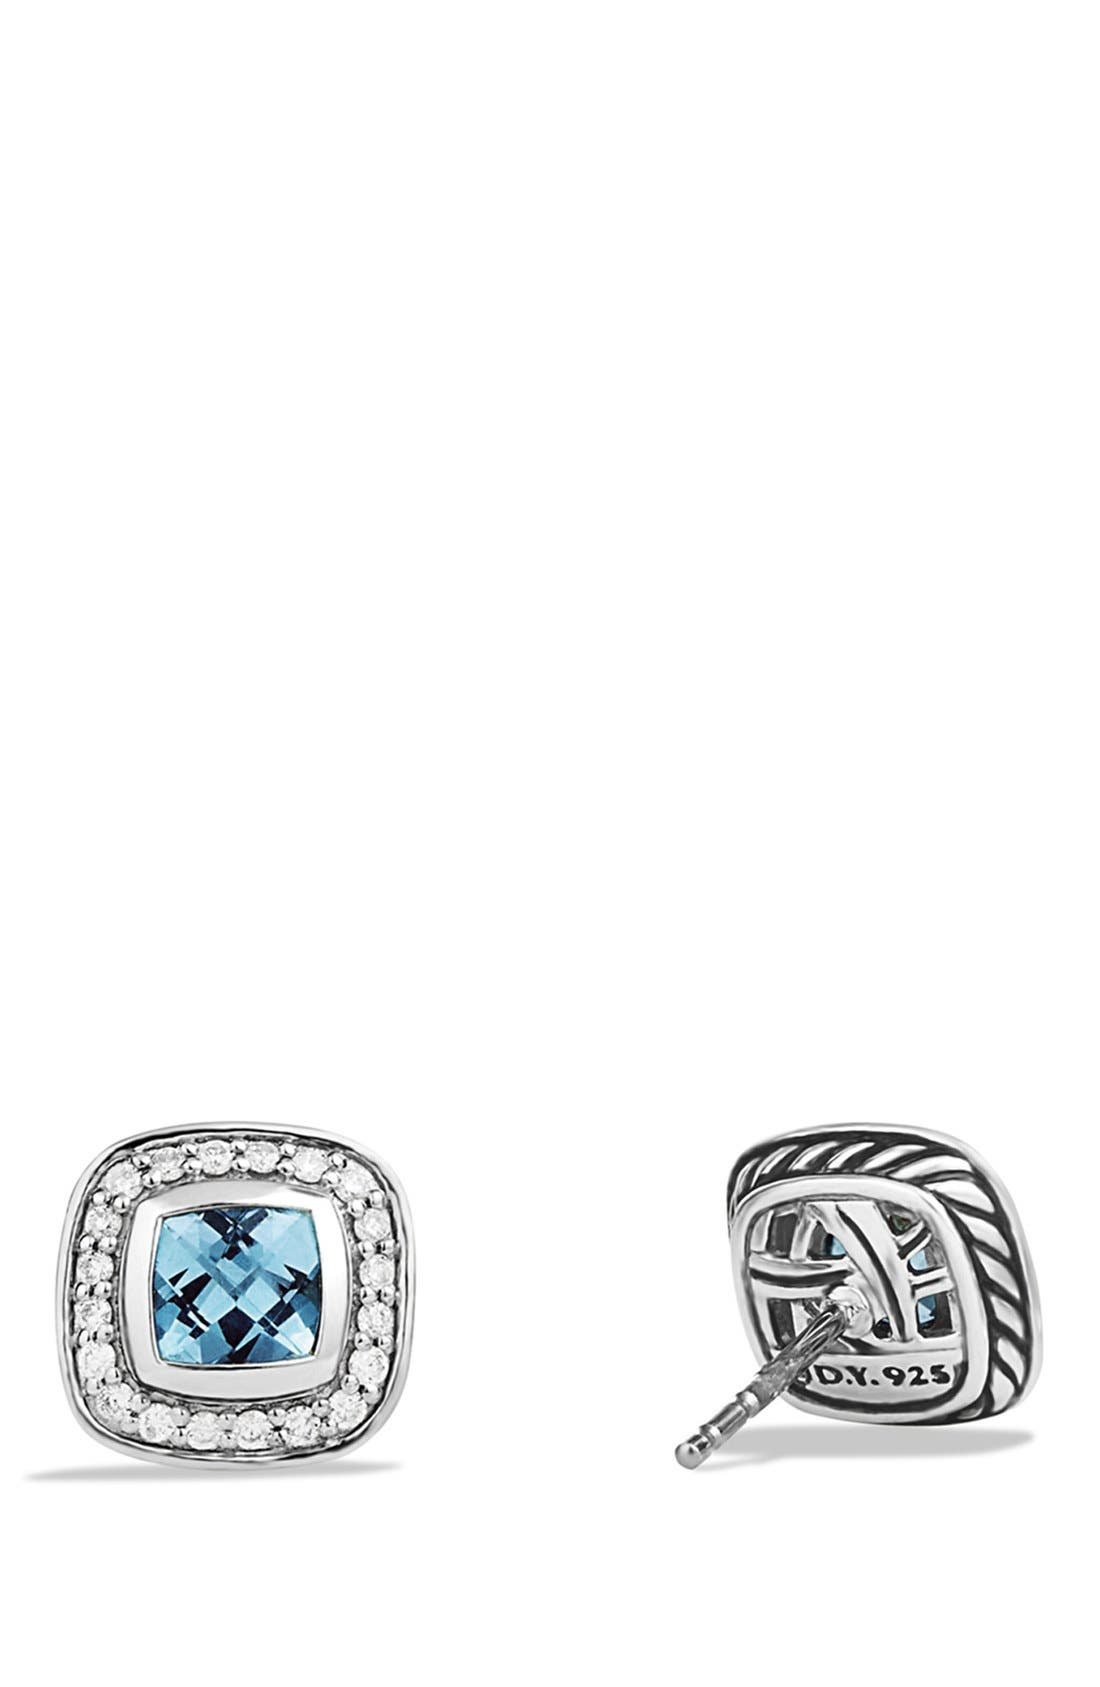 'Albion' Petite Earrings with Diamonds,                             Alternate thumbnail 3, color,                             BLUE TOPAZ